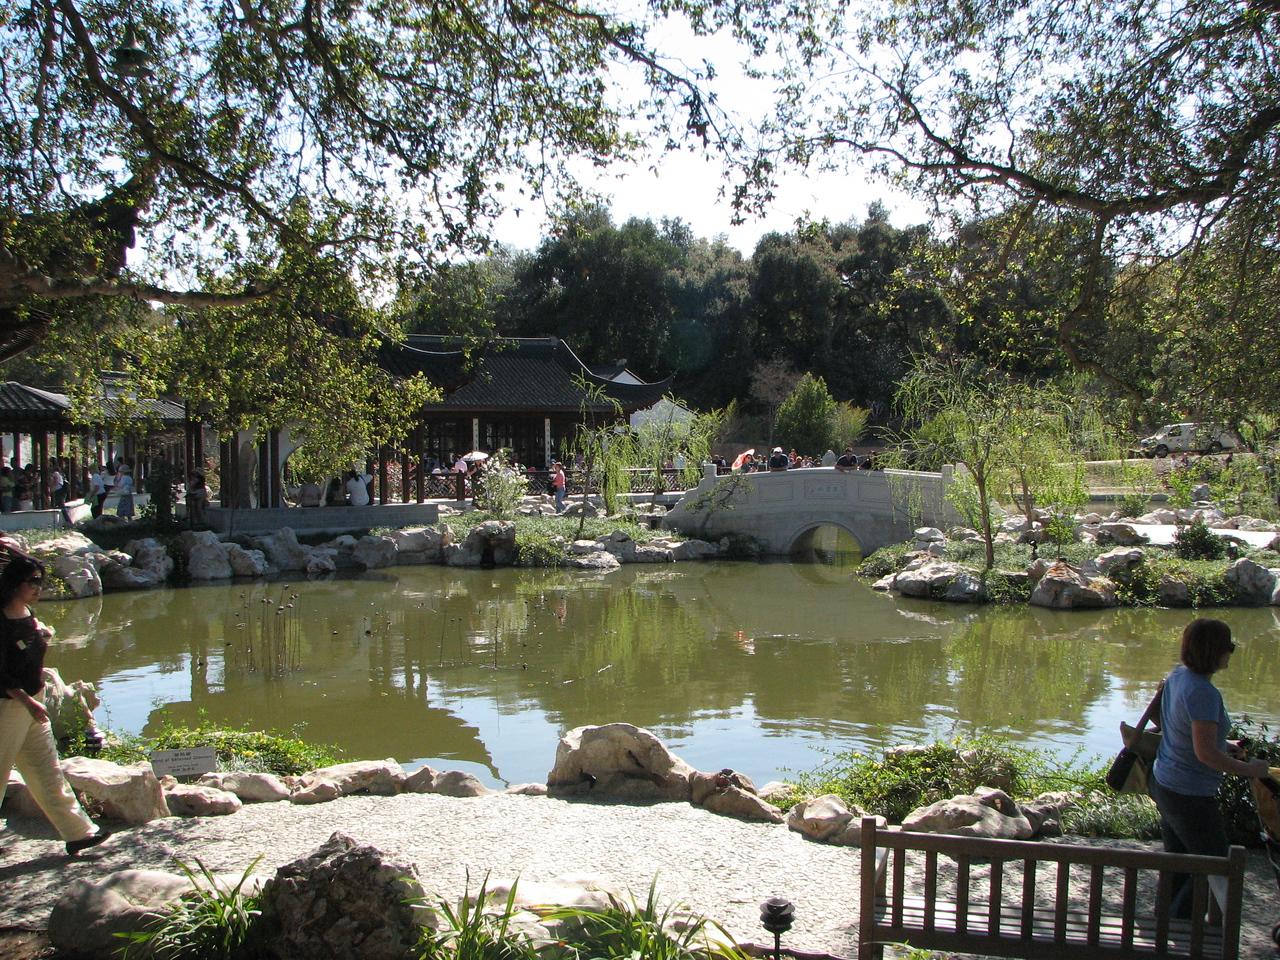 2008 03 09 Sun - New Chinese garden 1